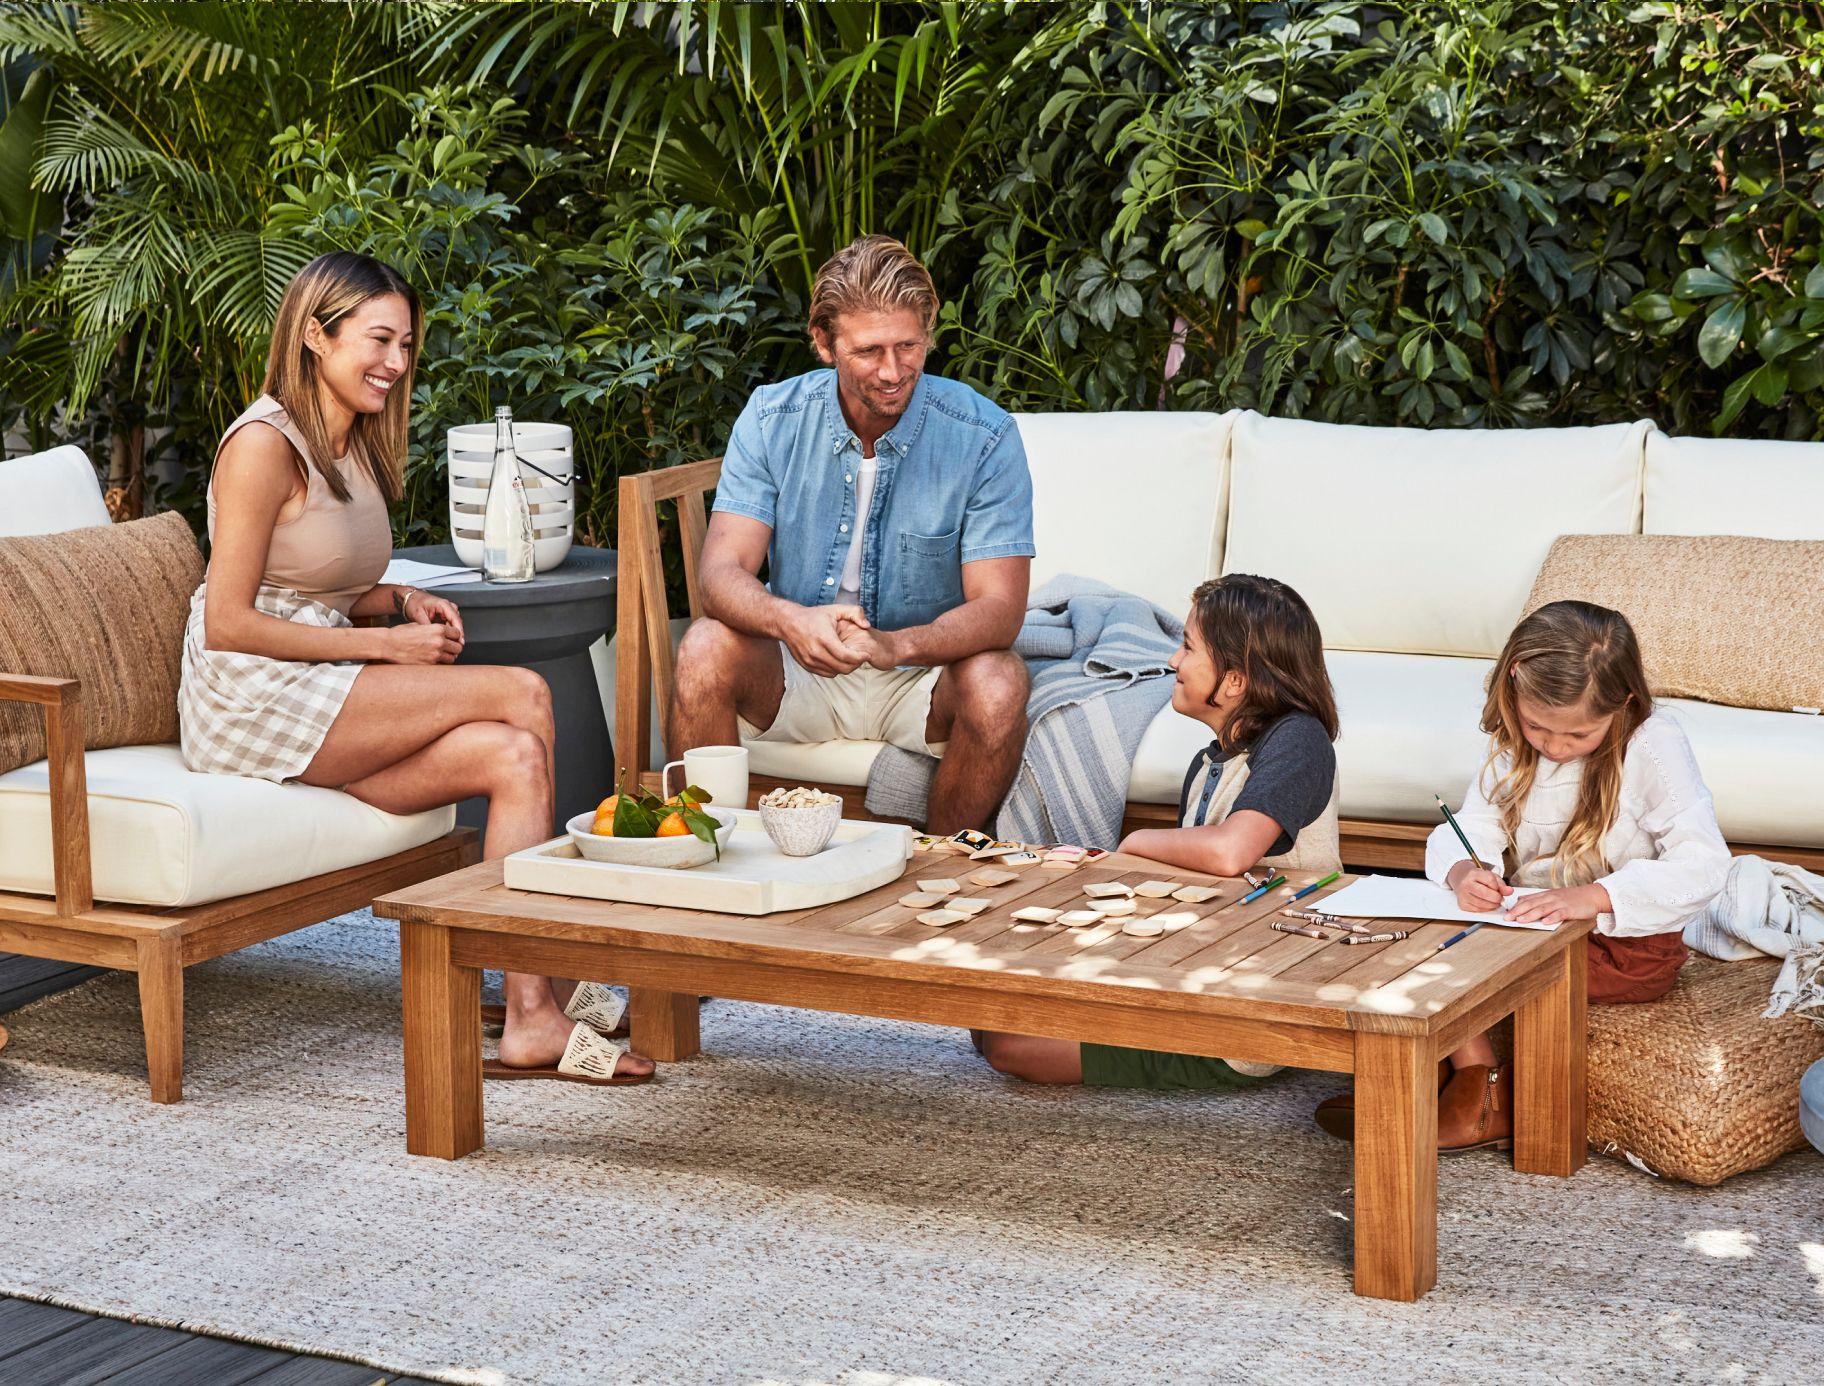 Family outside enjoying their teak wood furniture